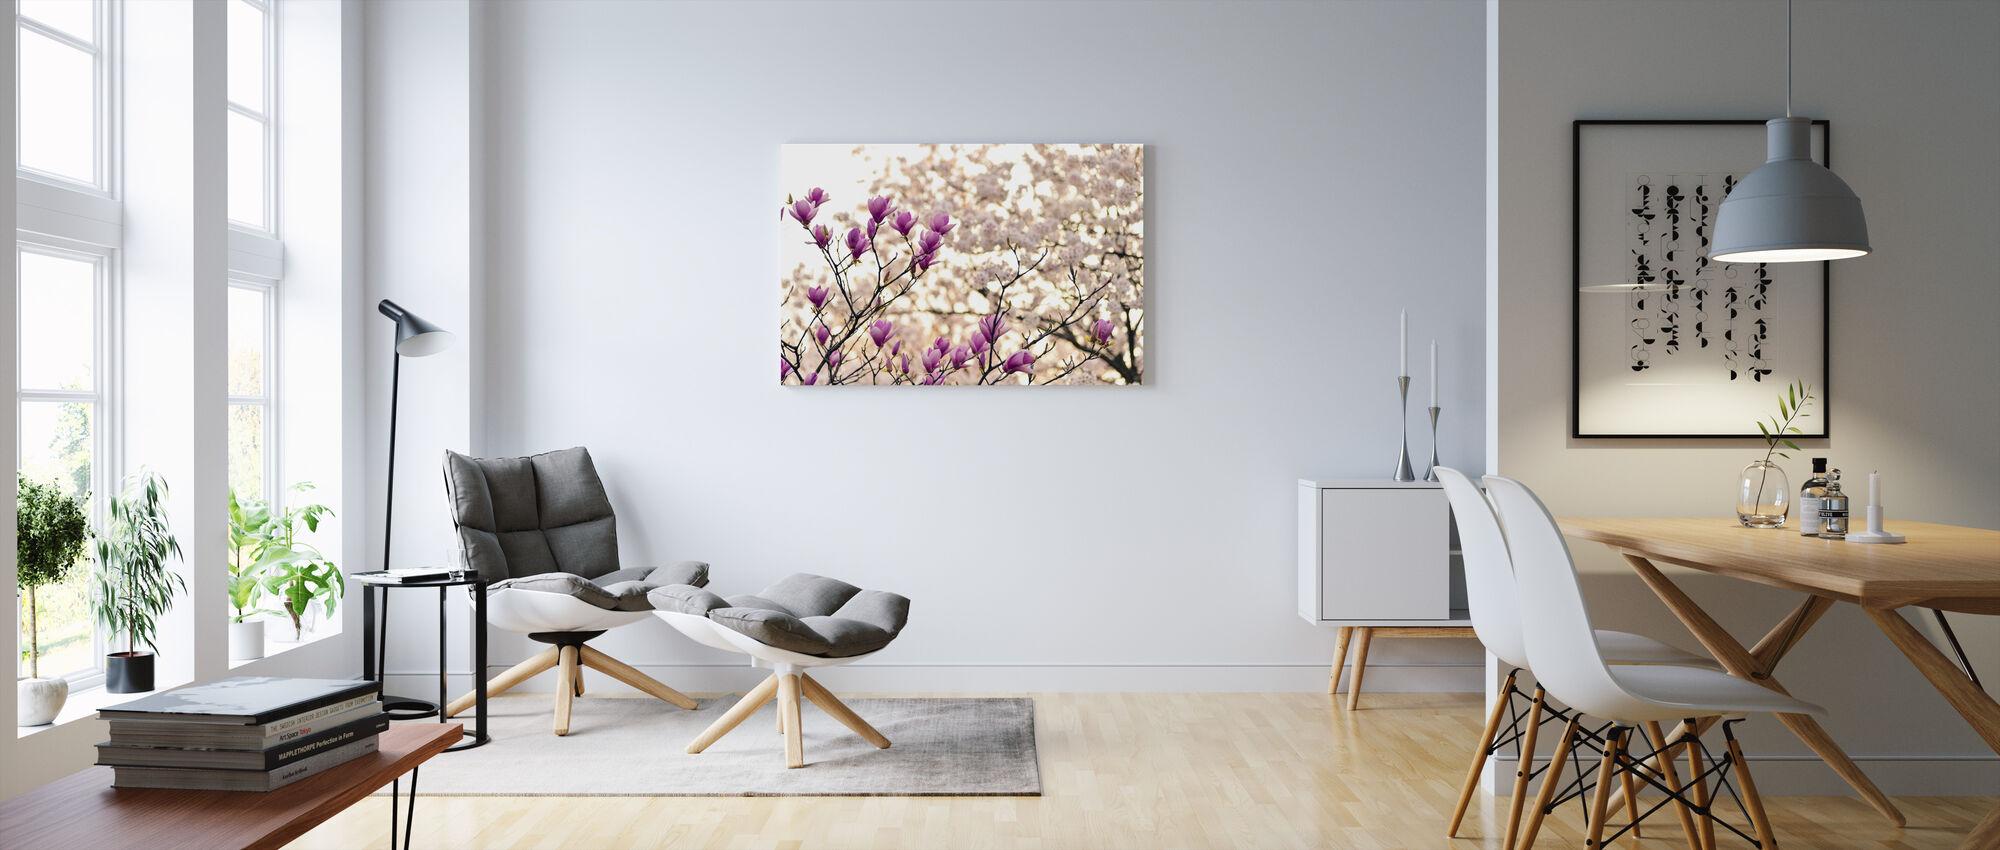 Magnolia Bloemen - Canvas print - Woonkamer